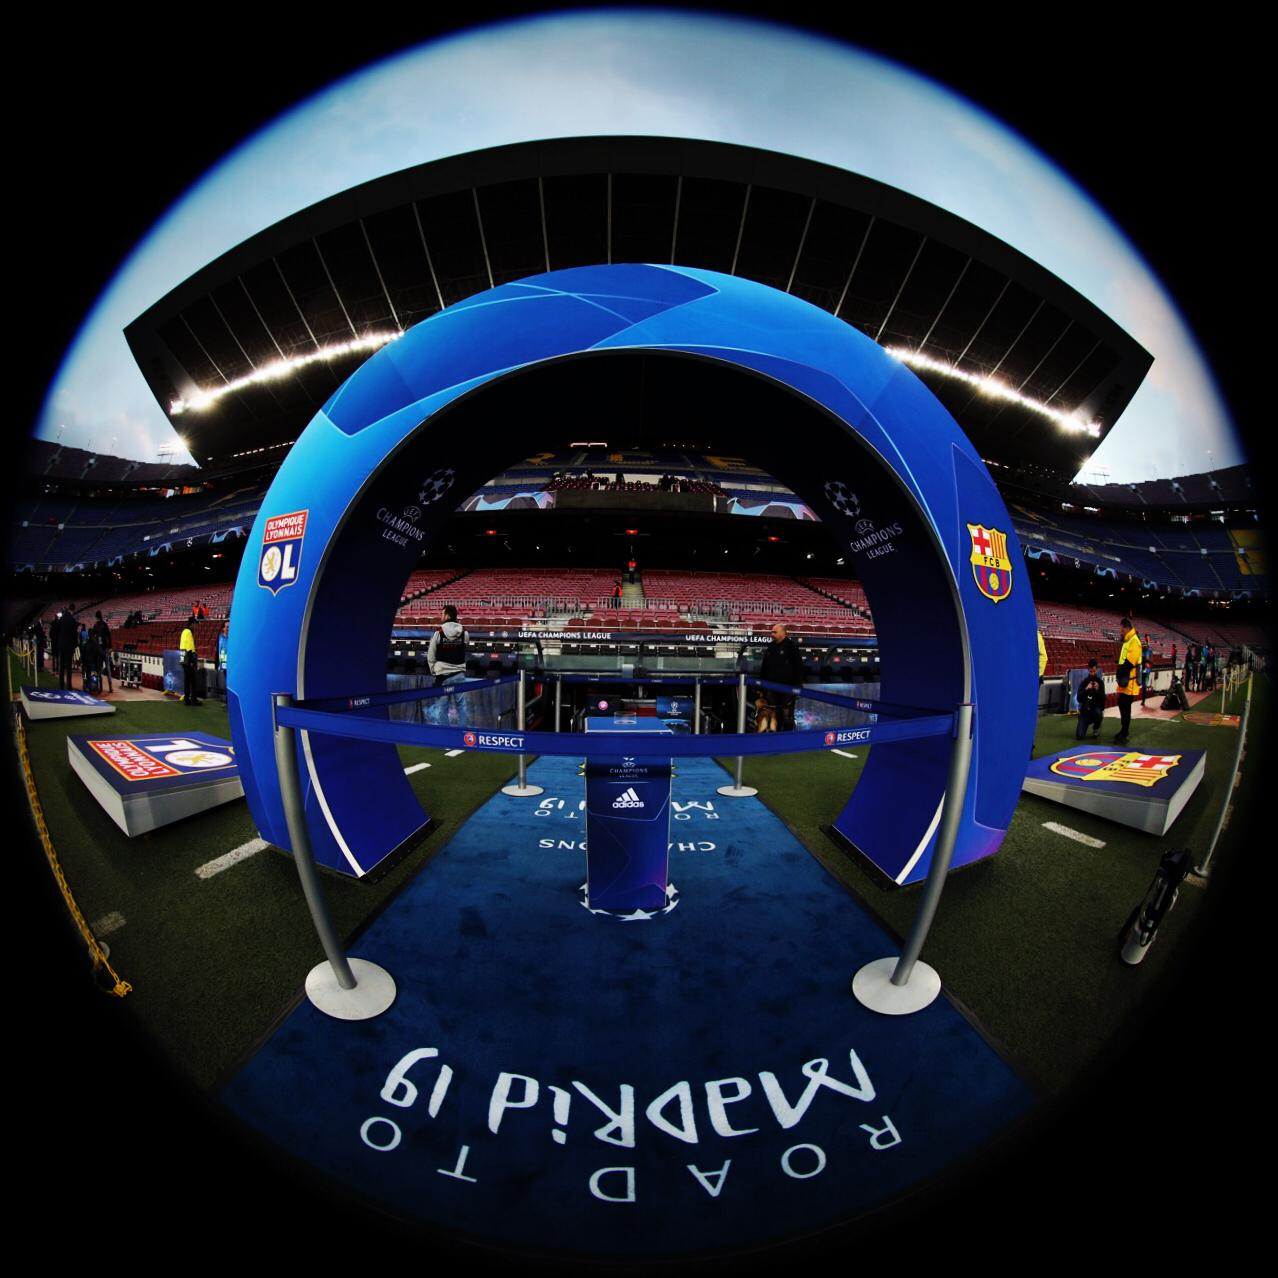 �� ¿Cómo van los nervios previos al partido? ¿Cuál es tu pronóstico? �� Camp Nou #BarçaOL ���� FORÇA BARÇA! https://t.co/i8kX6rZnpG